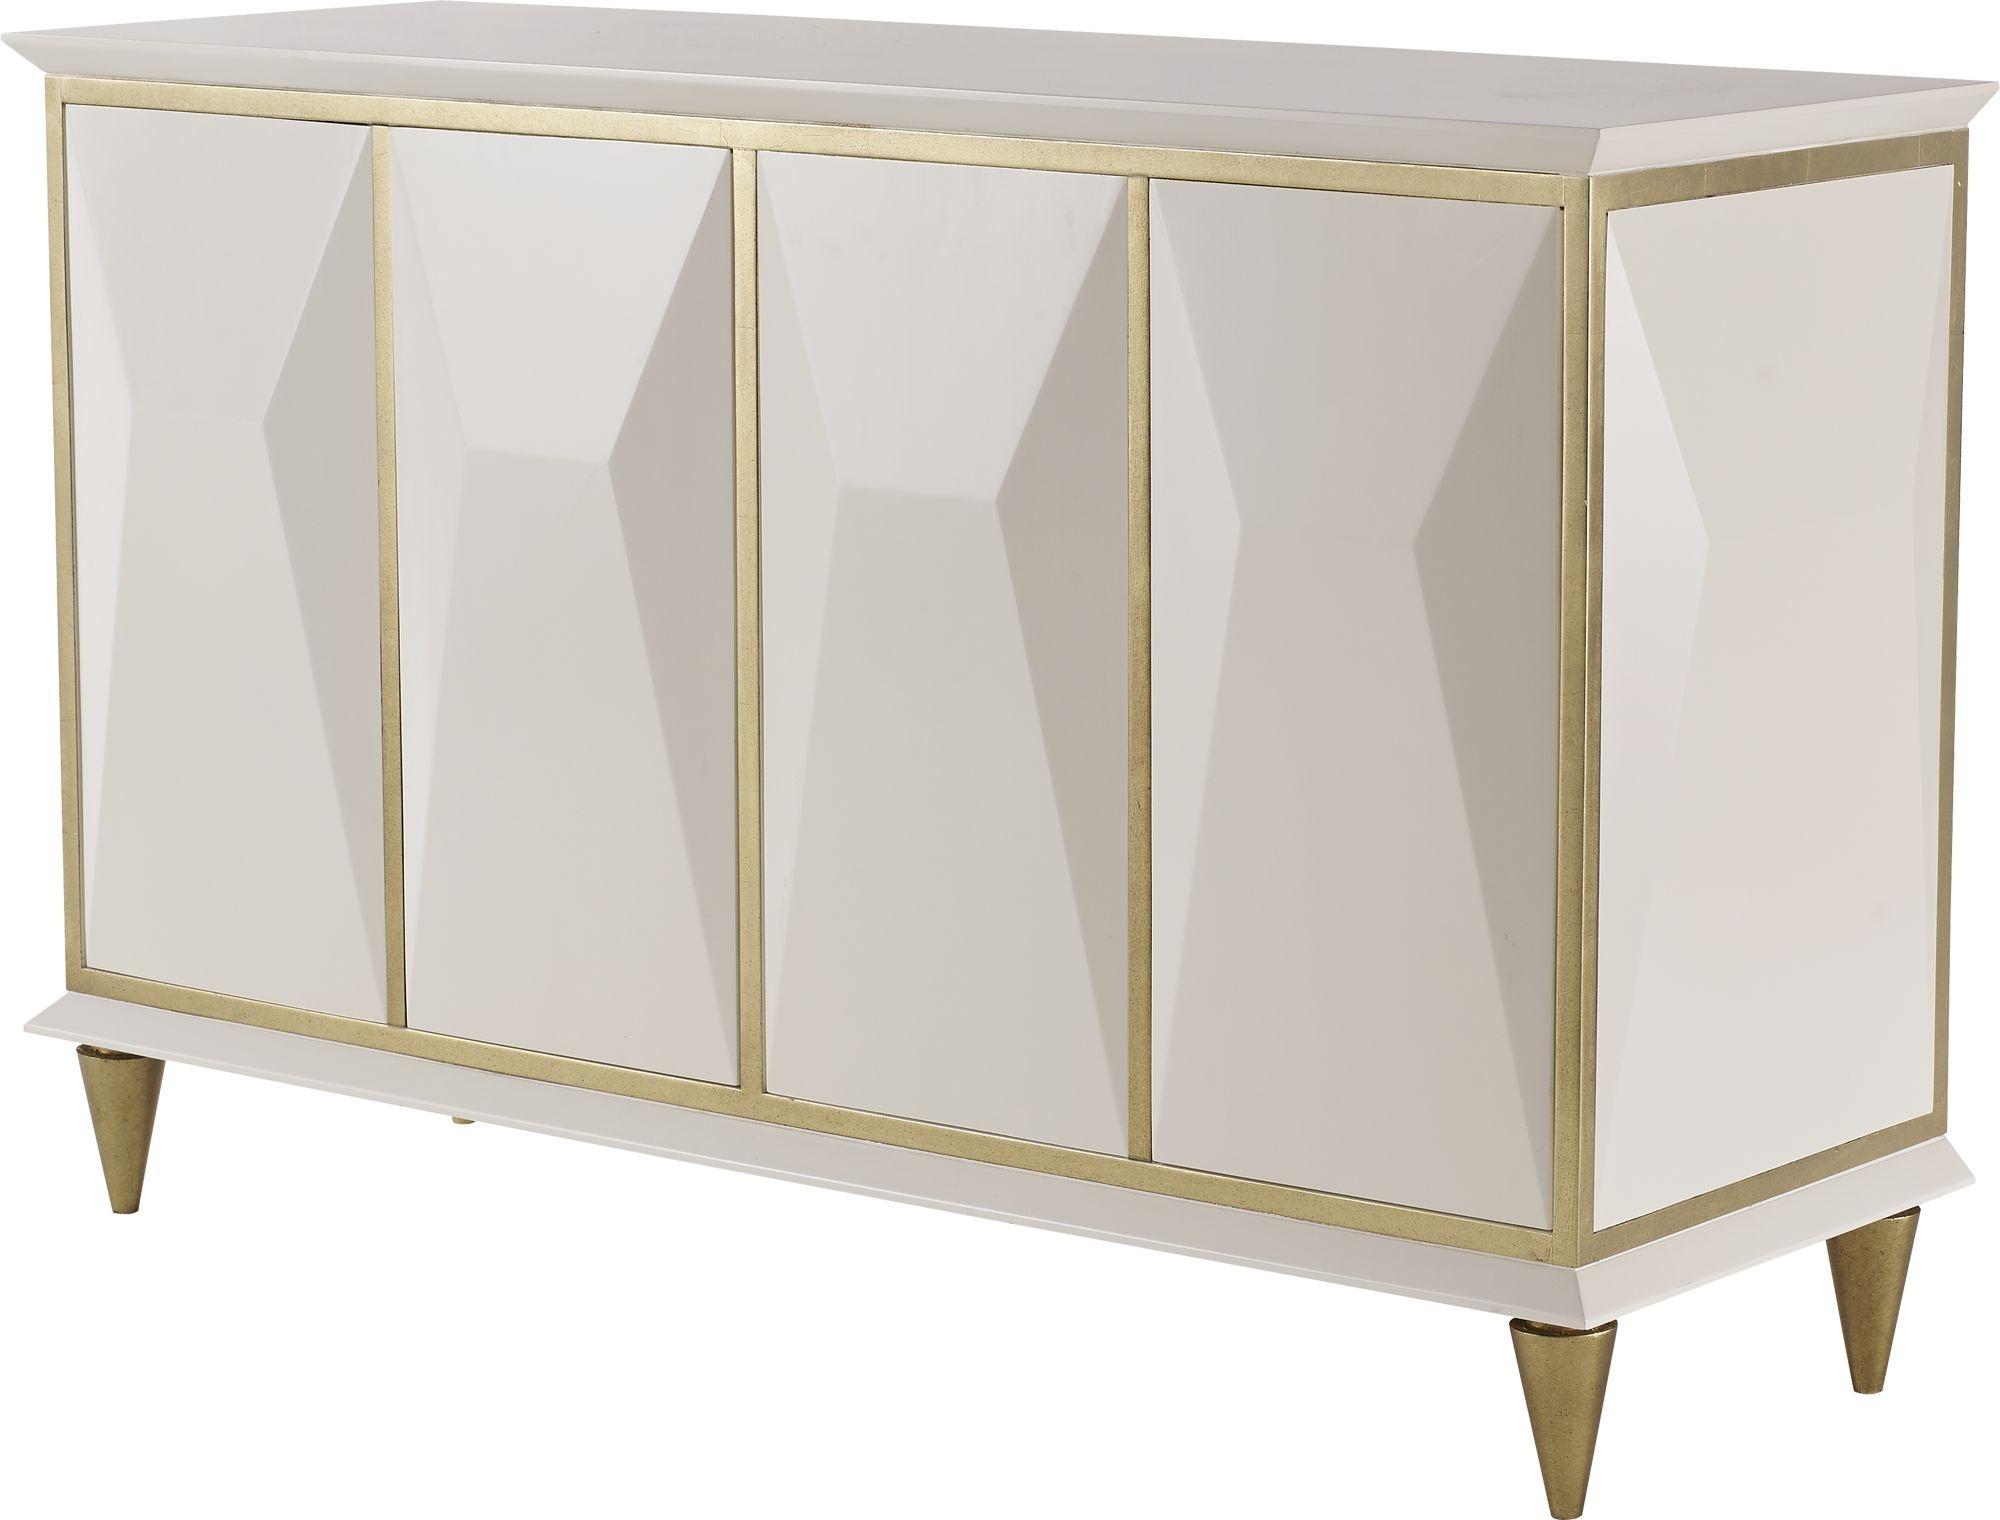 Baker Furniture Jean Louis Deniot Heliodor Decorative Chest 3175